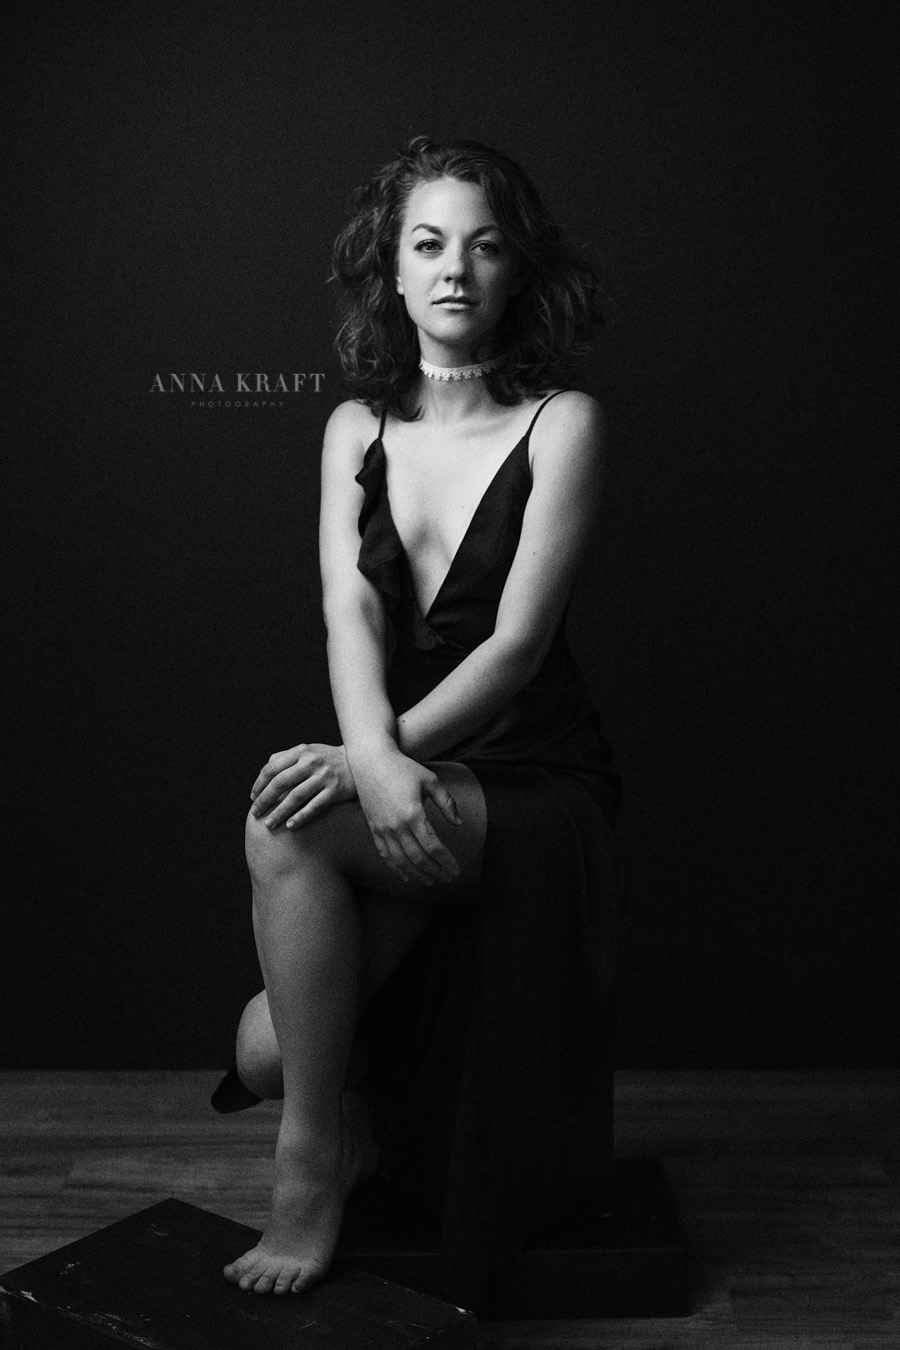 anna_kraft_photography_georgetown_square_studio_family_portrait-24.jpg